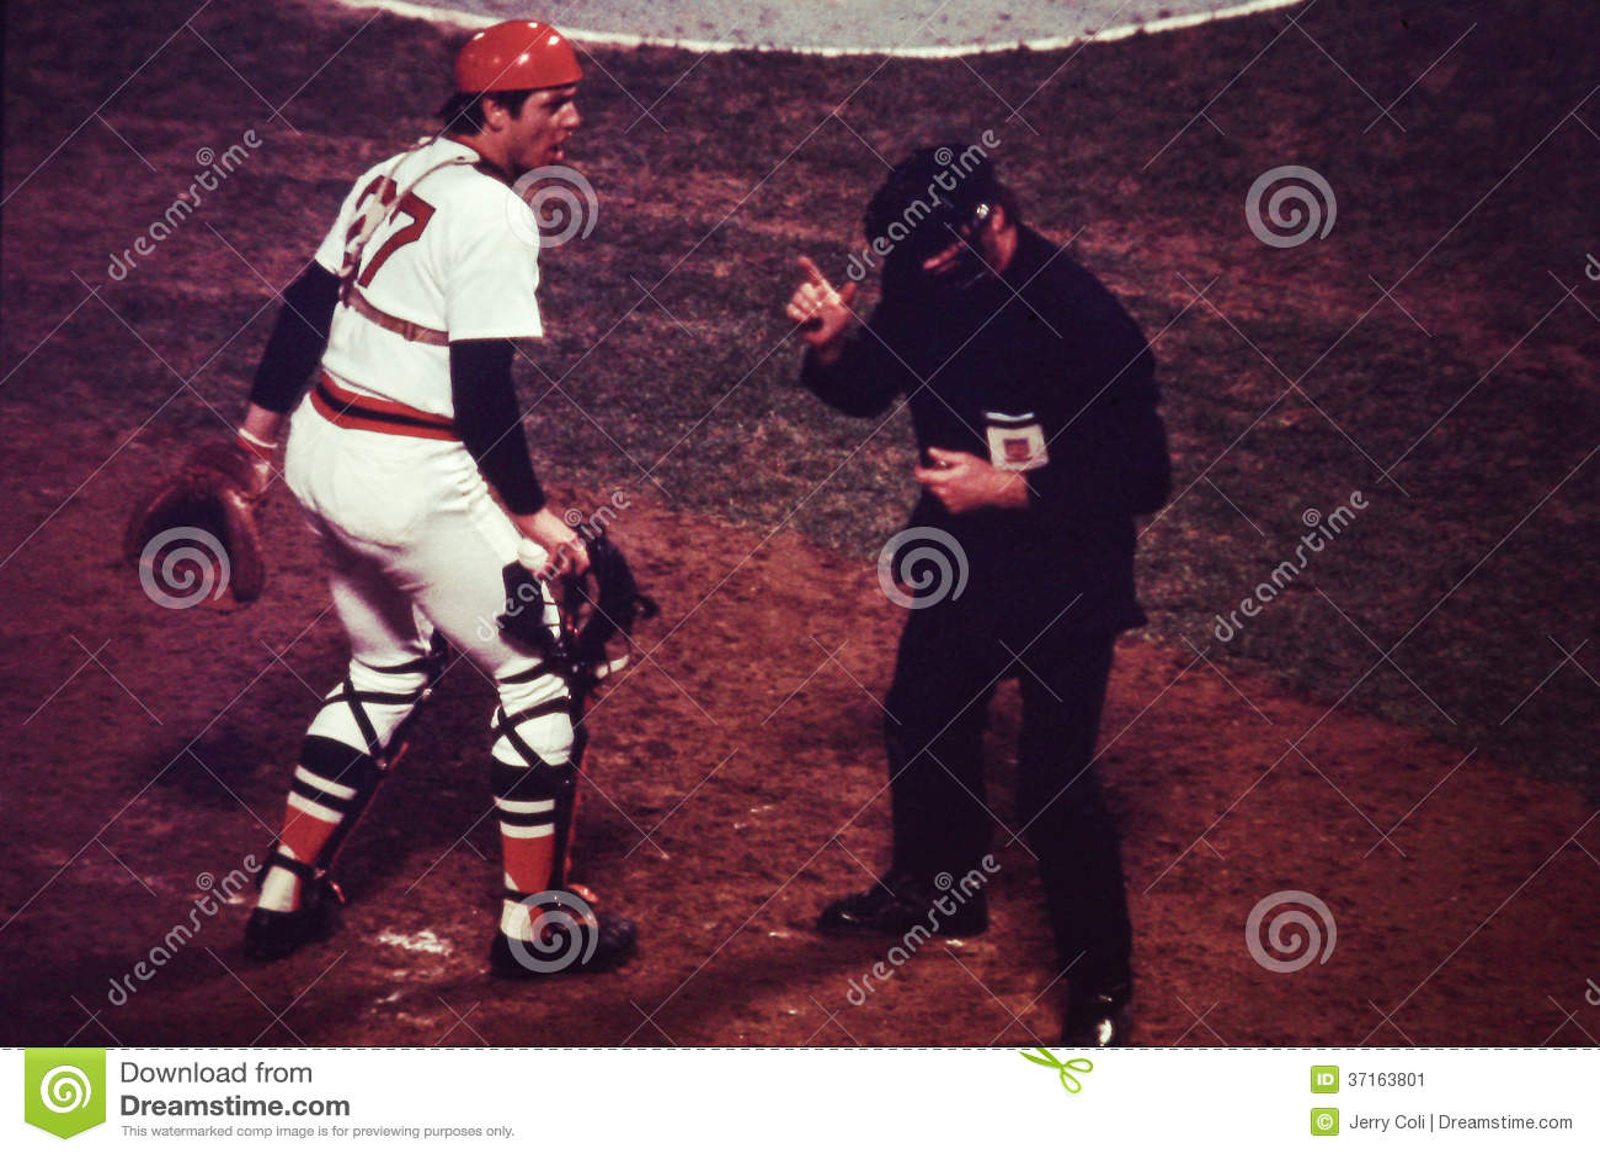 Carlton Fisk, Boston Red Sox